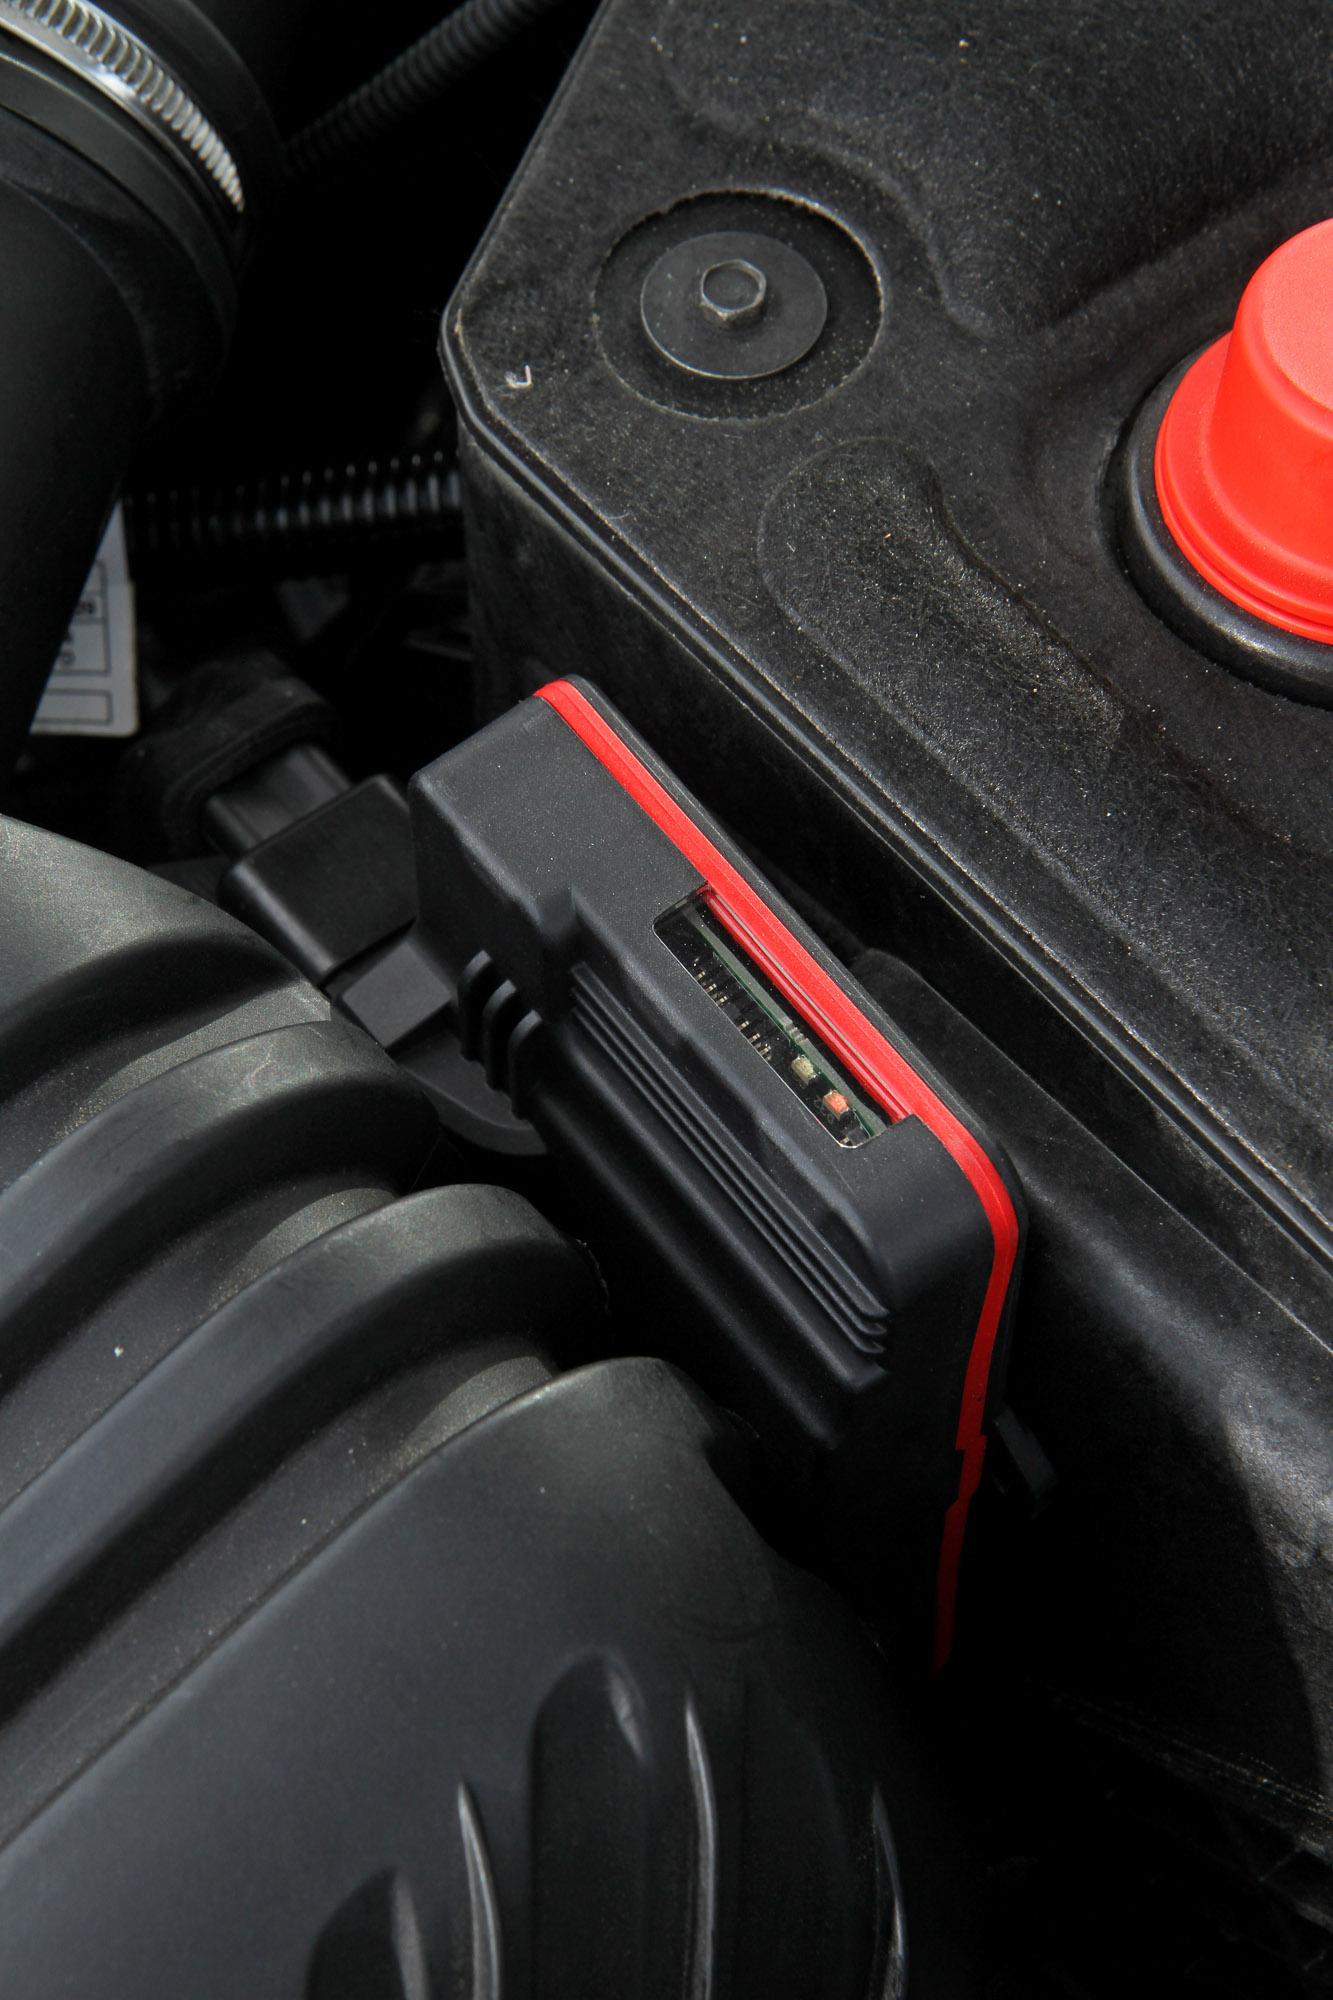 Mini Cup Race Car >> Maxi-Tuner MINI Cooper S F56